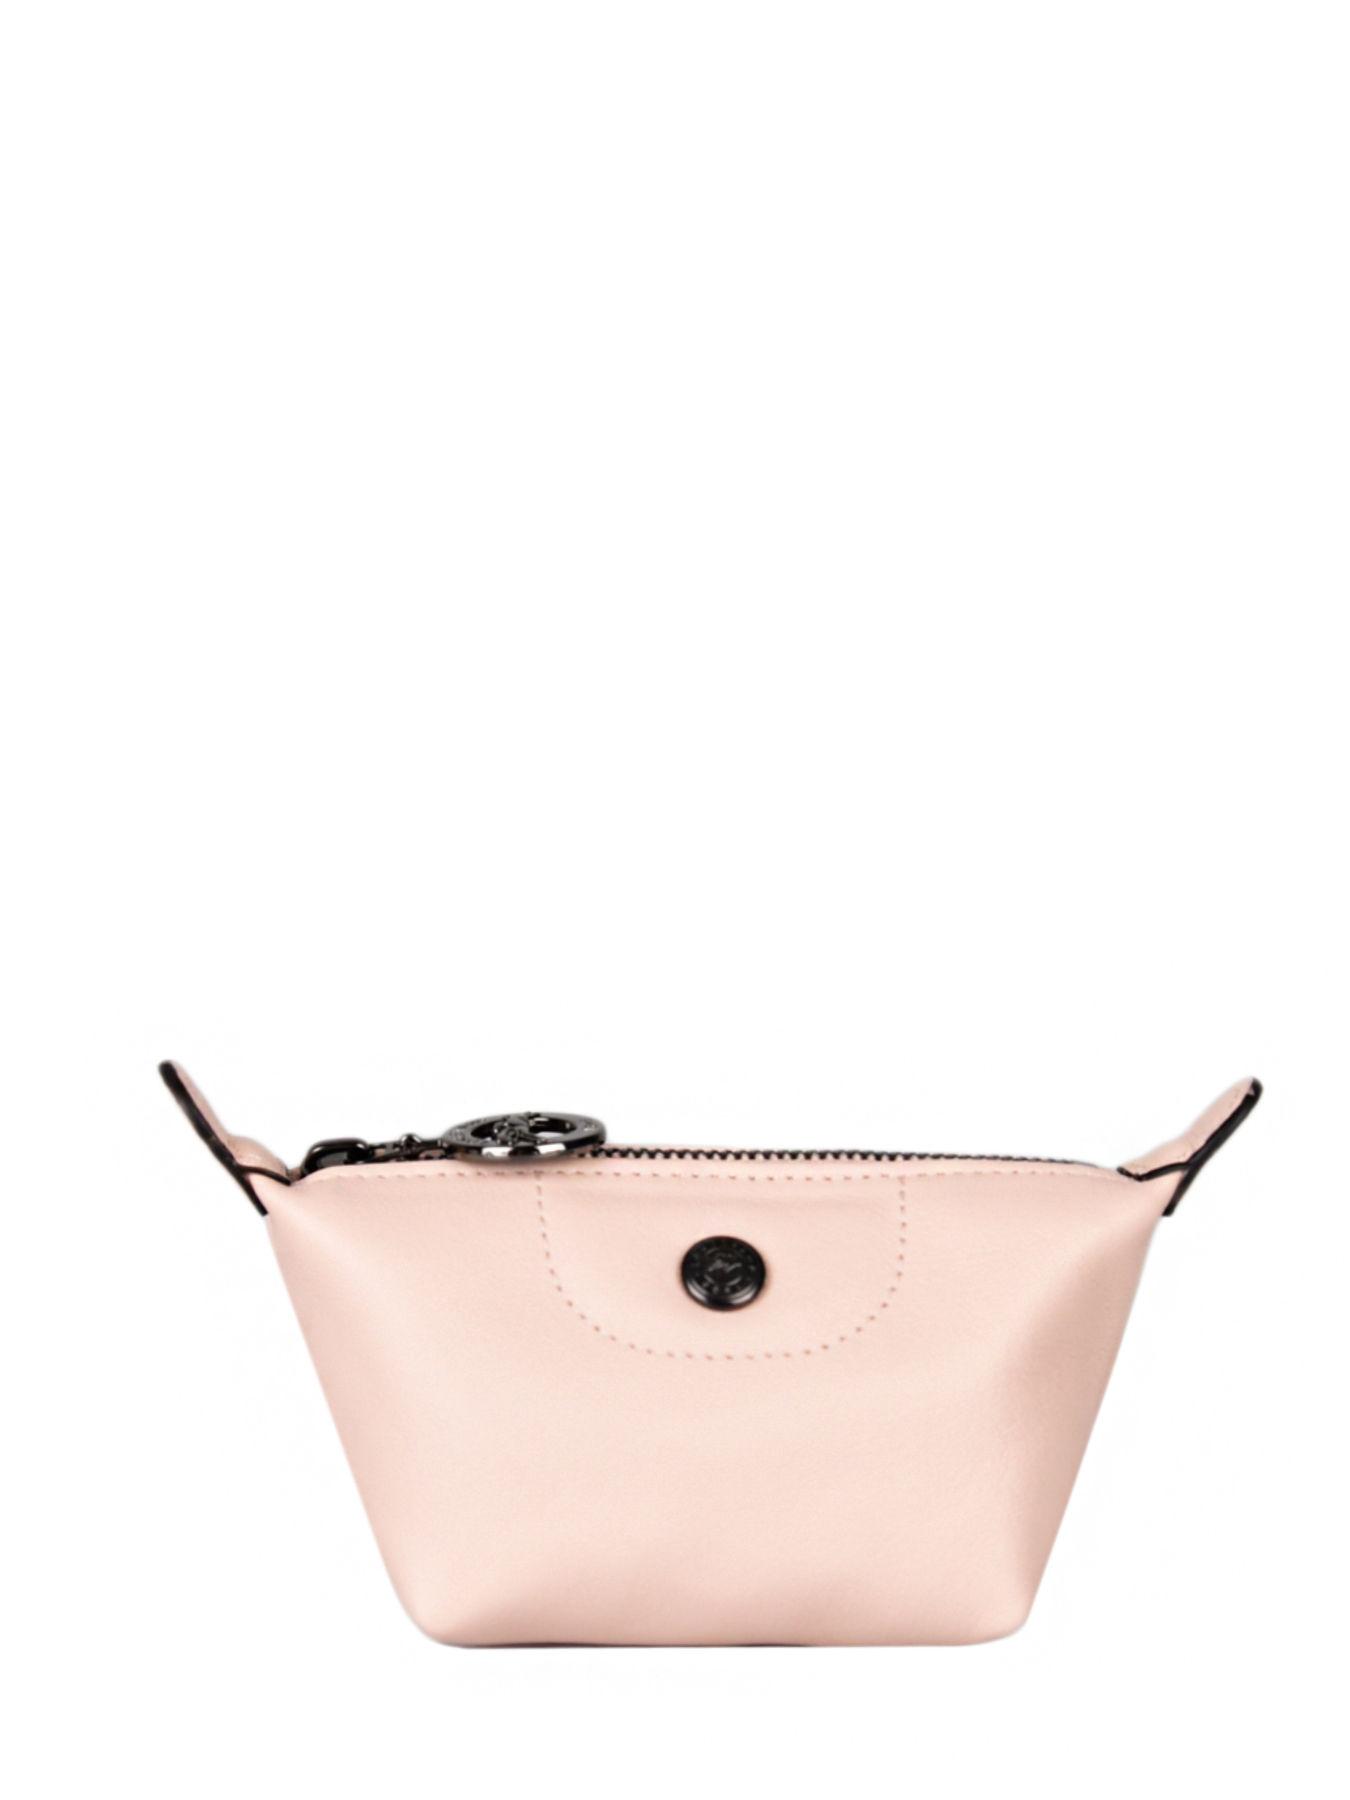 Leather Le Pliage Cuir coin purse LONGCHAMP